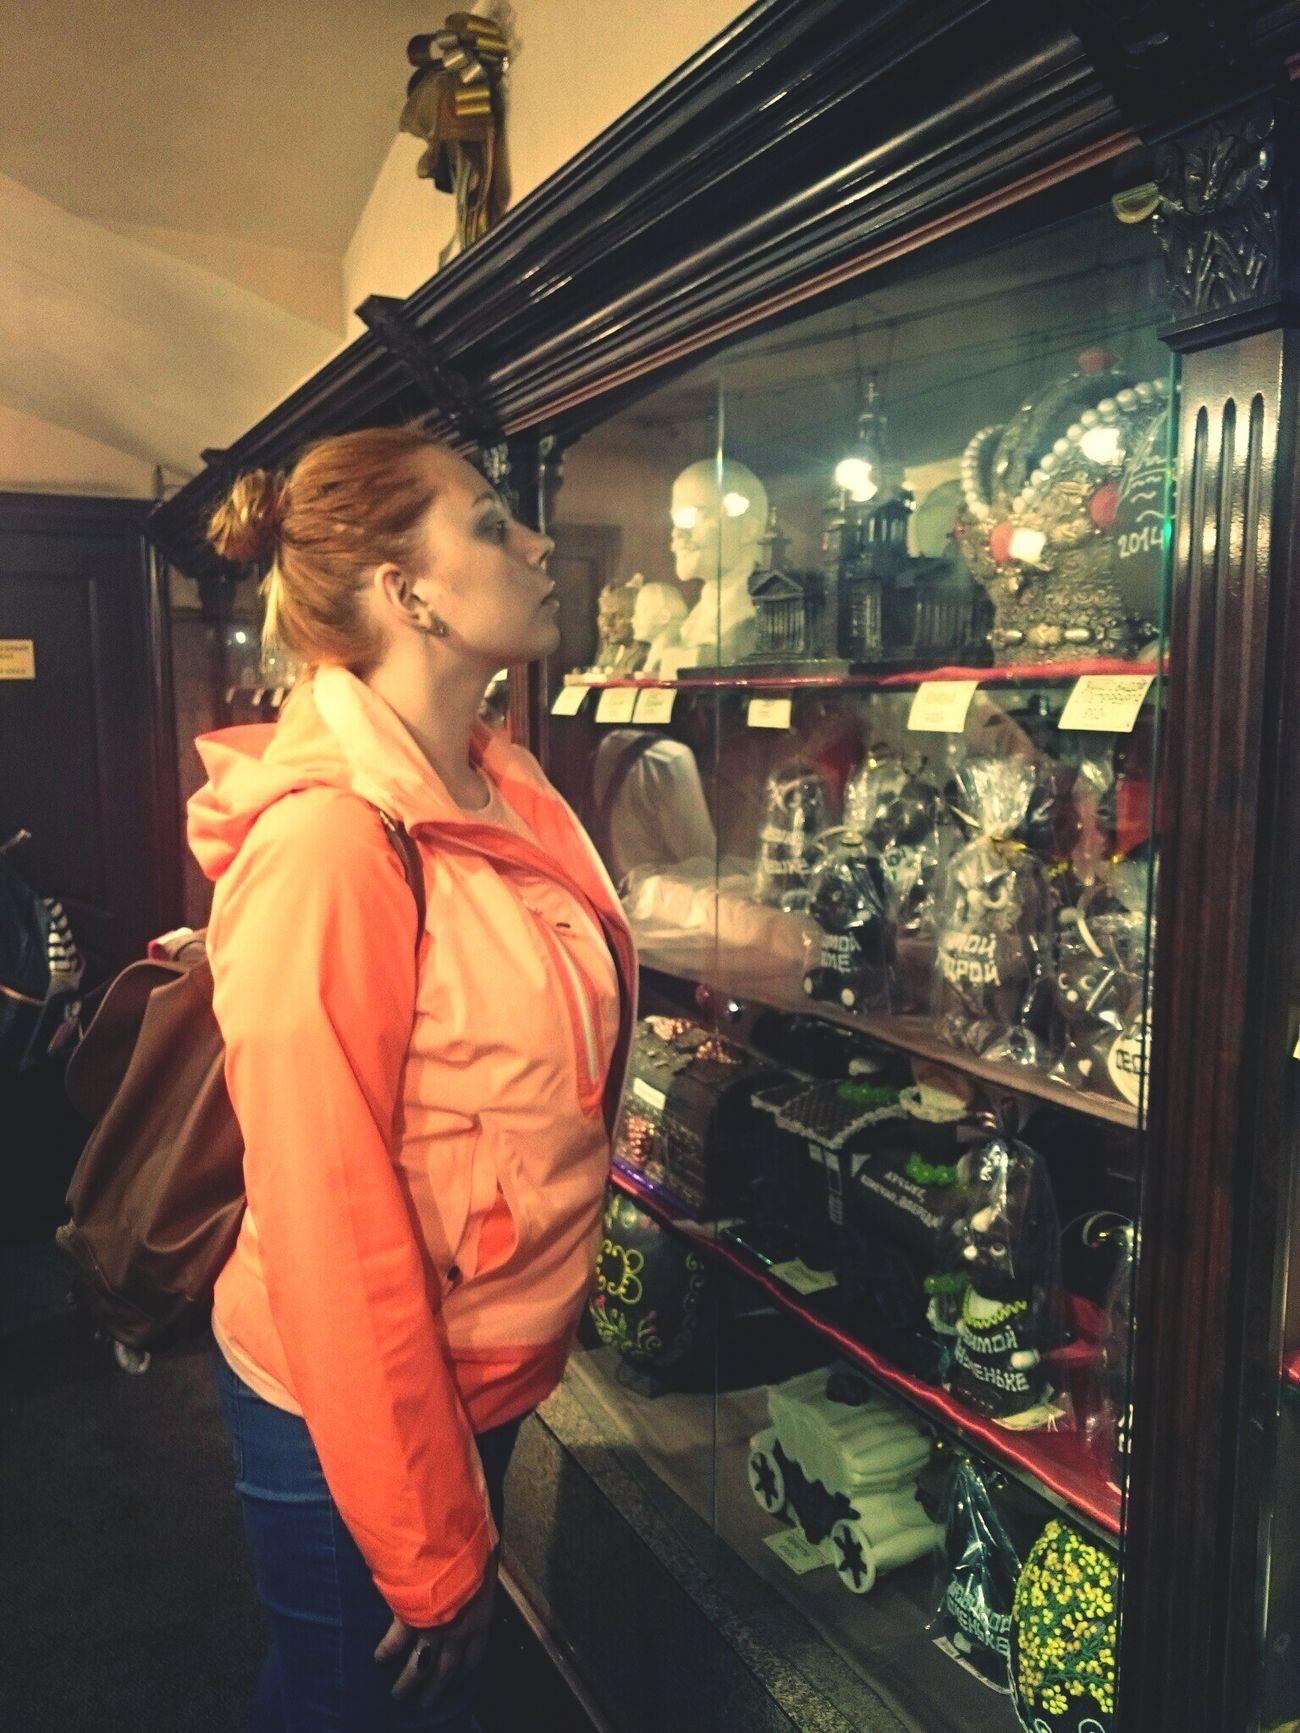 Музей шоколада Chocolate♡ Chokolate Museum Museum Санкт-Петербург Petersburg One Woman Only St. Petersburg Only Women Yammy ♥ Iwantyou Delicious ♡